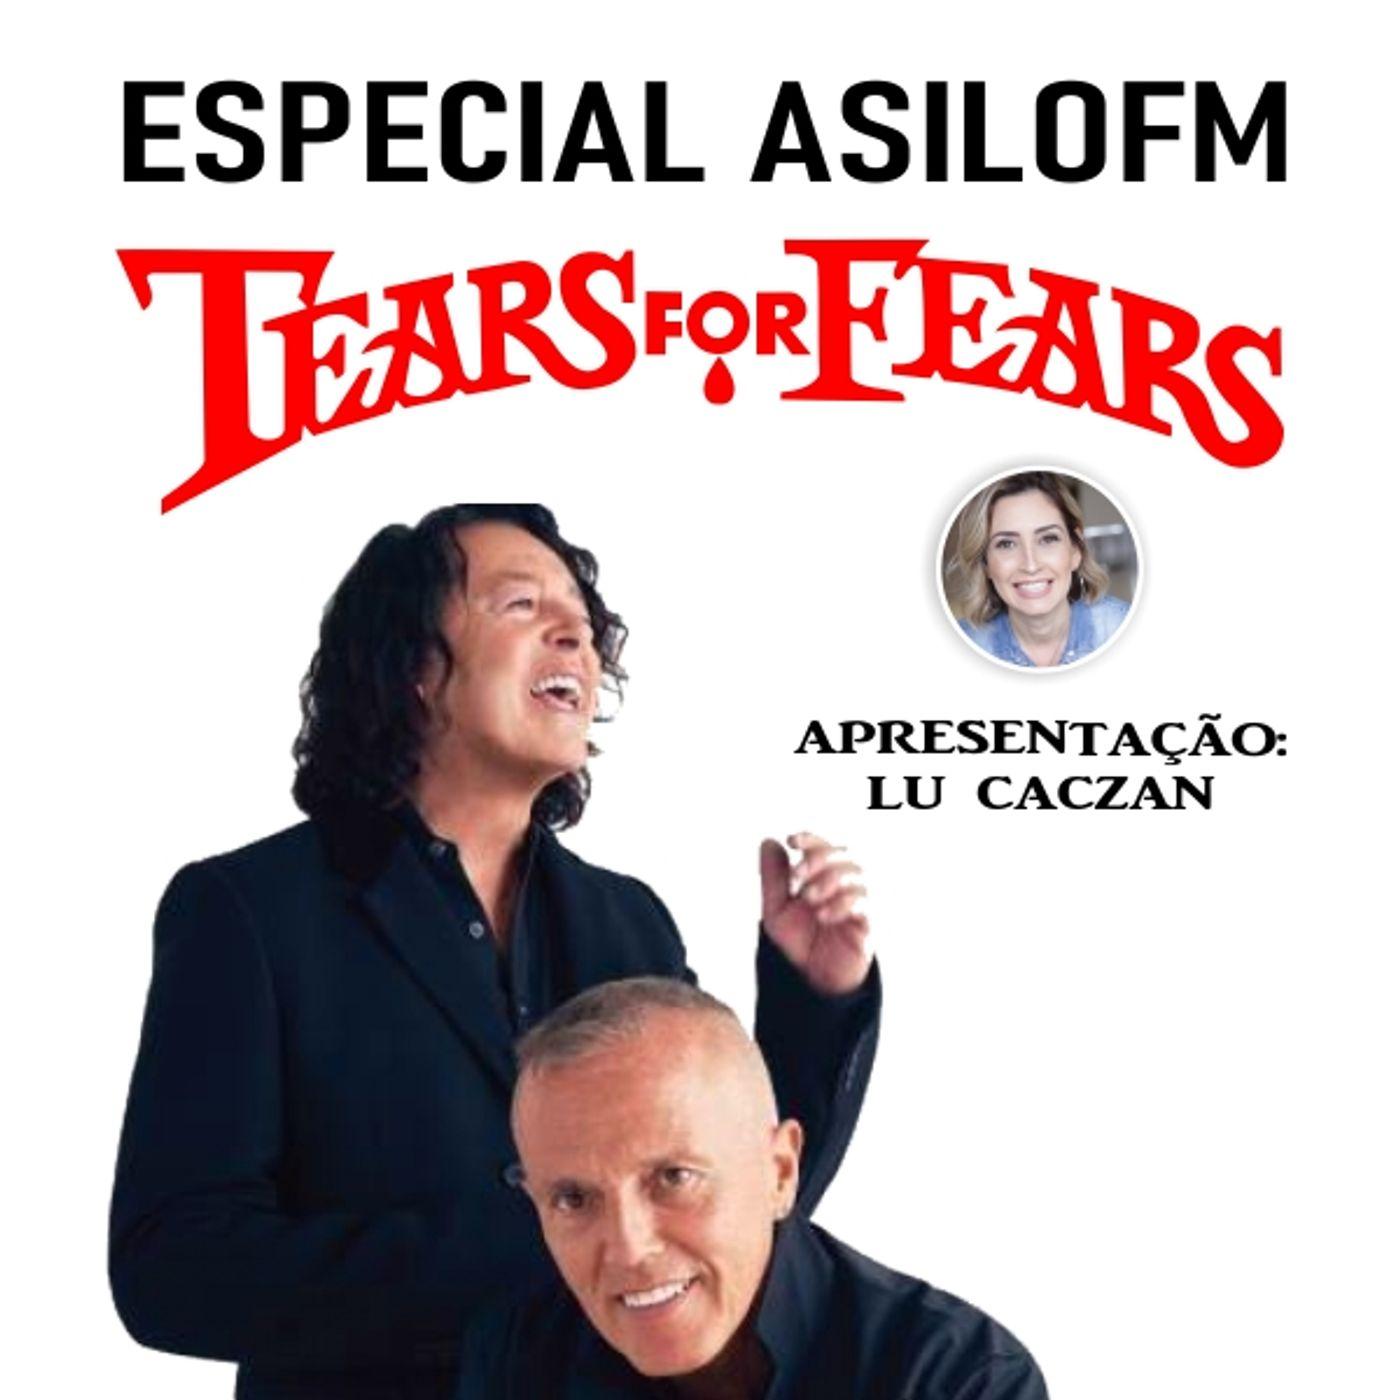 Especial Tears for Fears